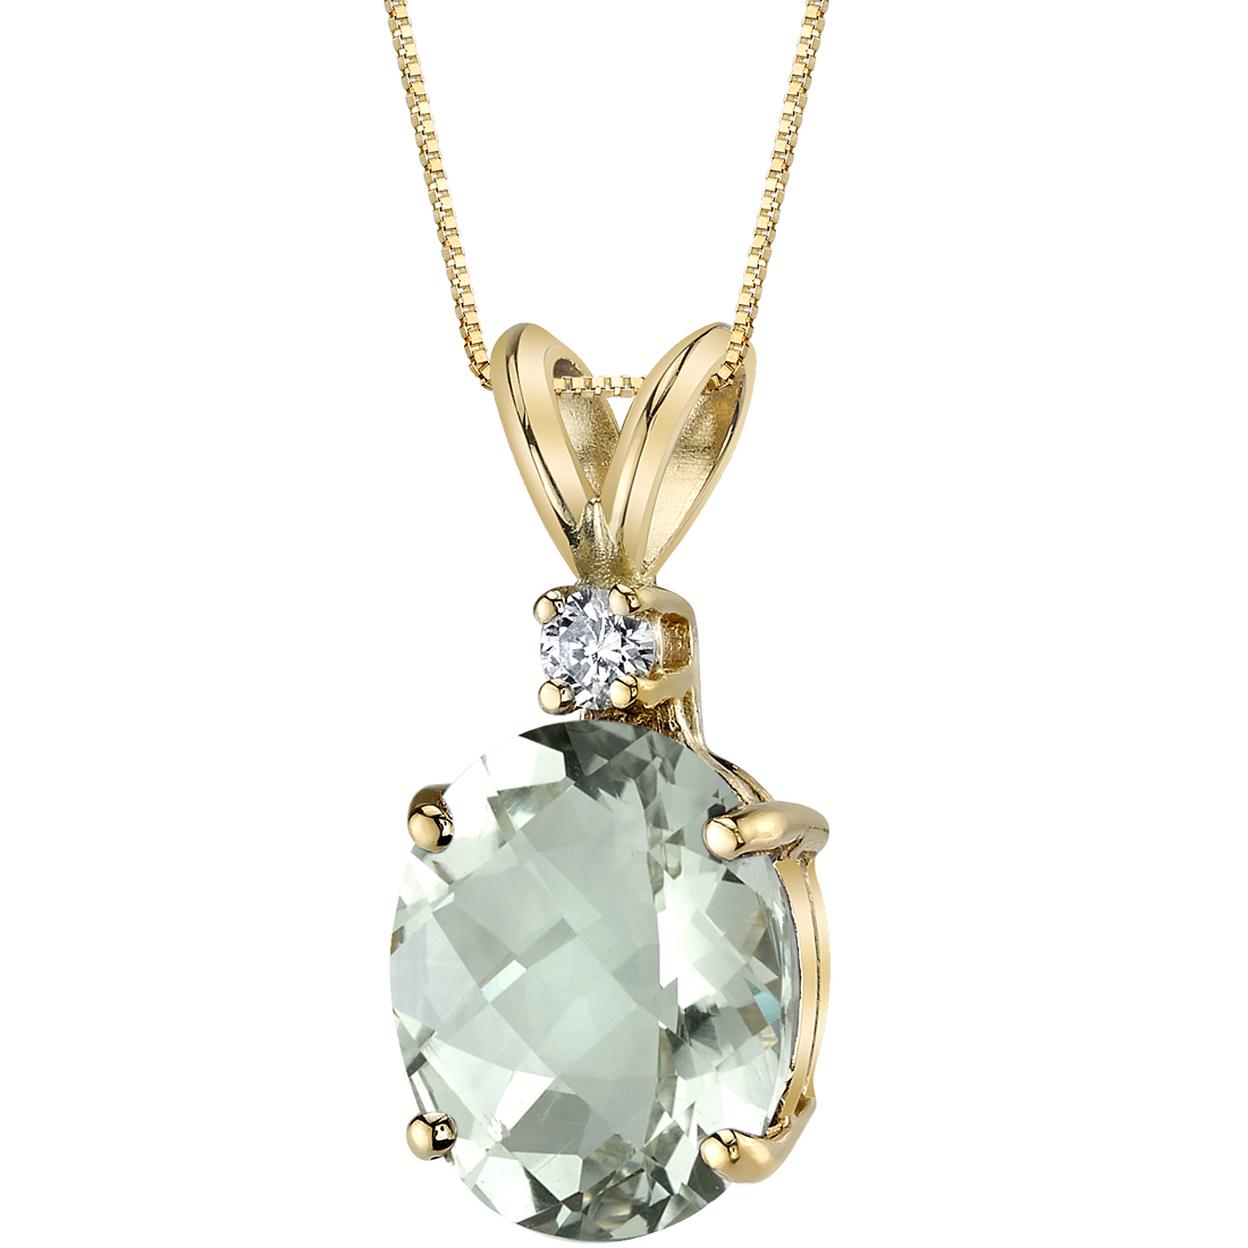 Oravo 14 Kt Yellow Gold Oval Shape 2.25 Carats Green Amethyst Diamond Pendant